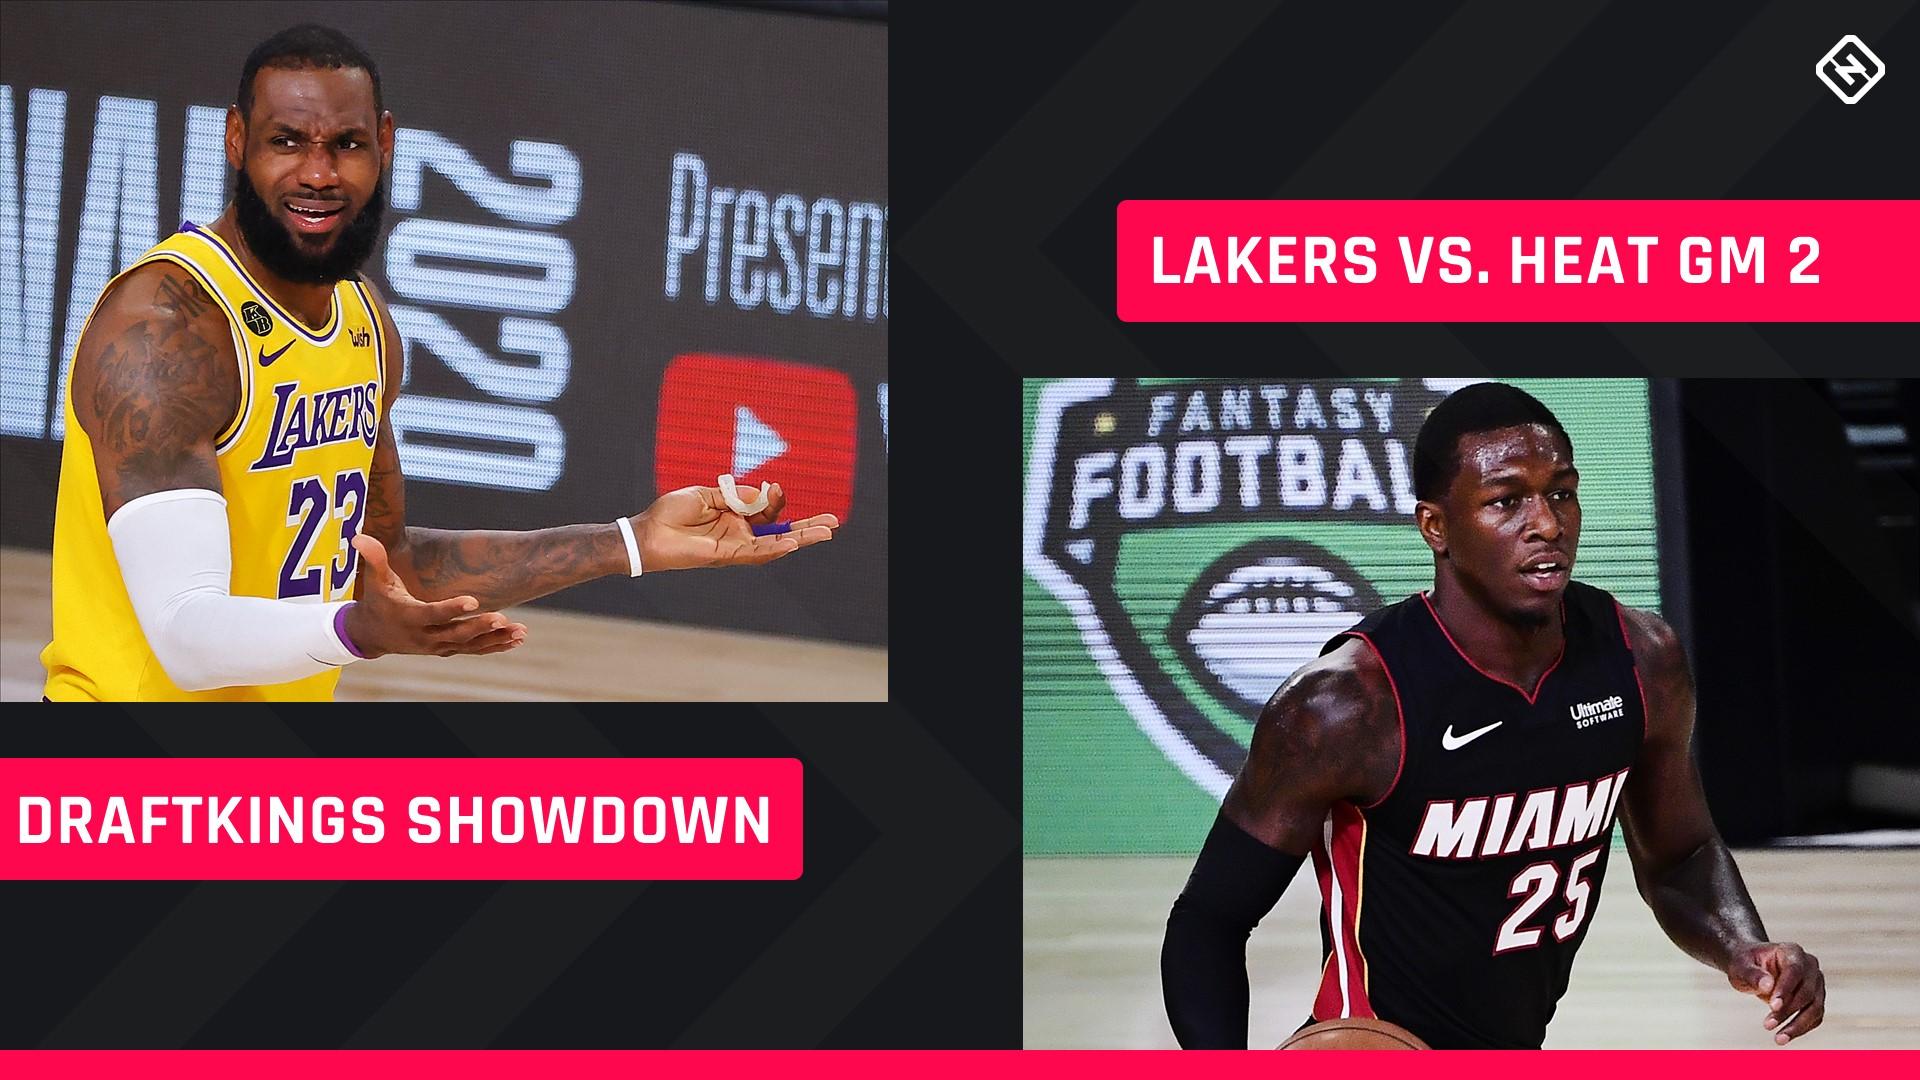 NBA Finals DraftKings Picks: NBA DFS lineup advice for Game 2 Lakers-Heat Showdown tournaments